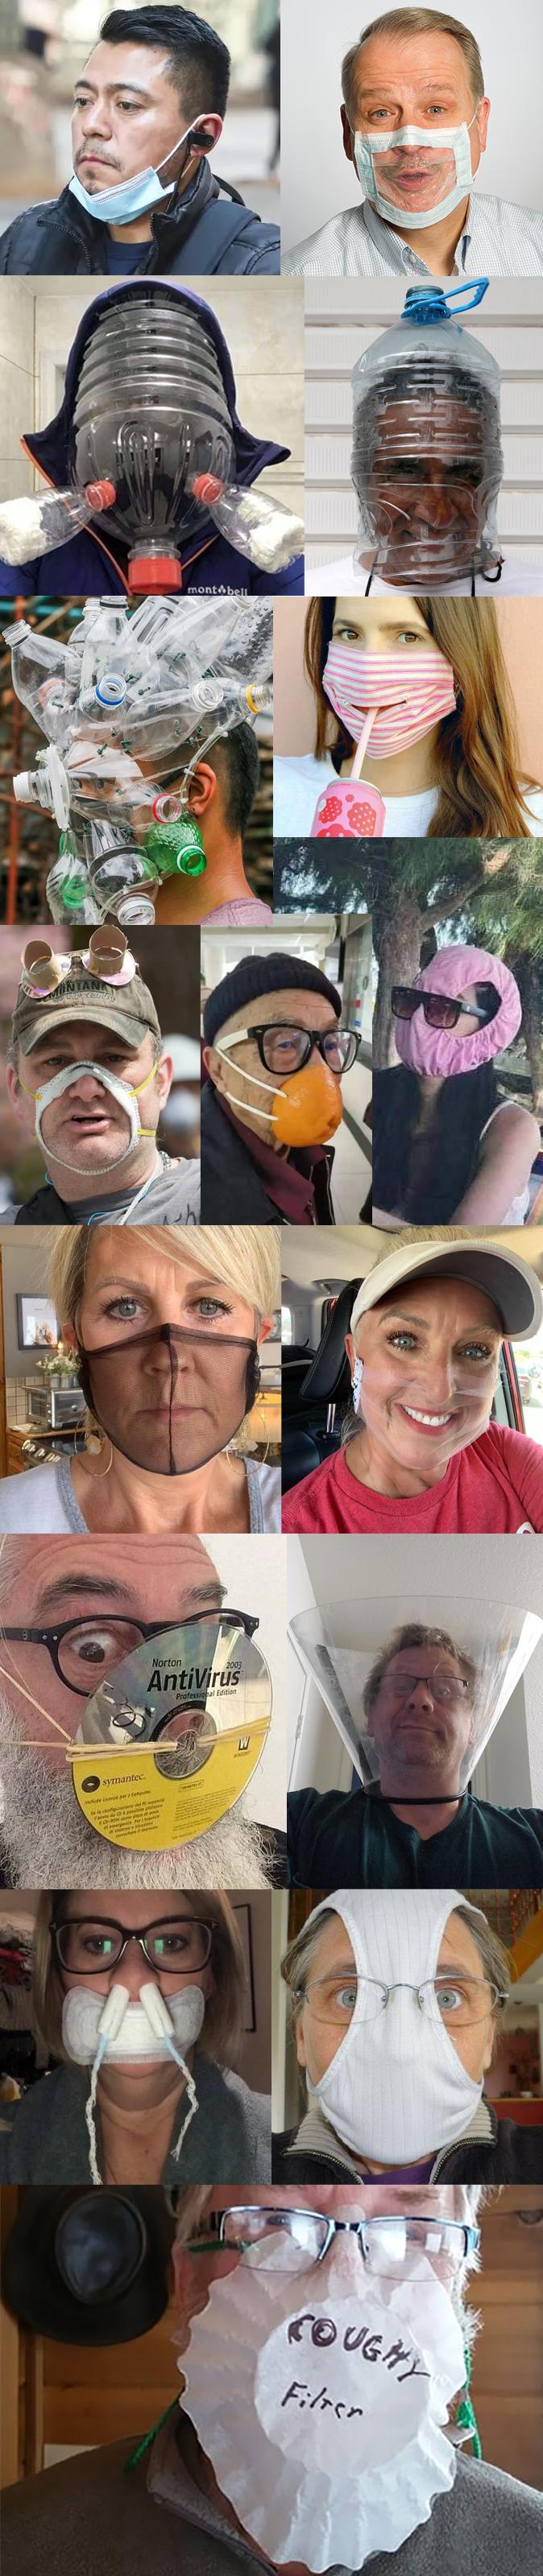 The Stupidest Face Masks